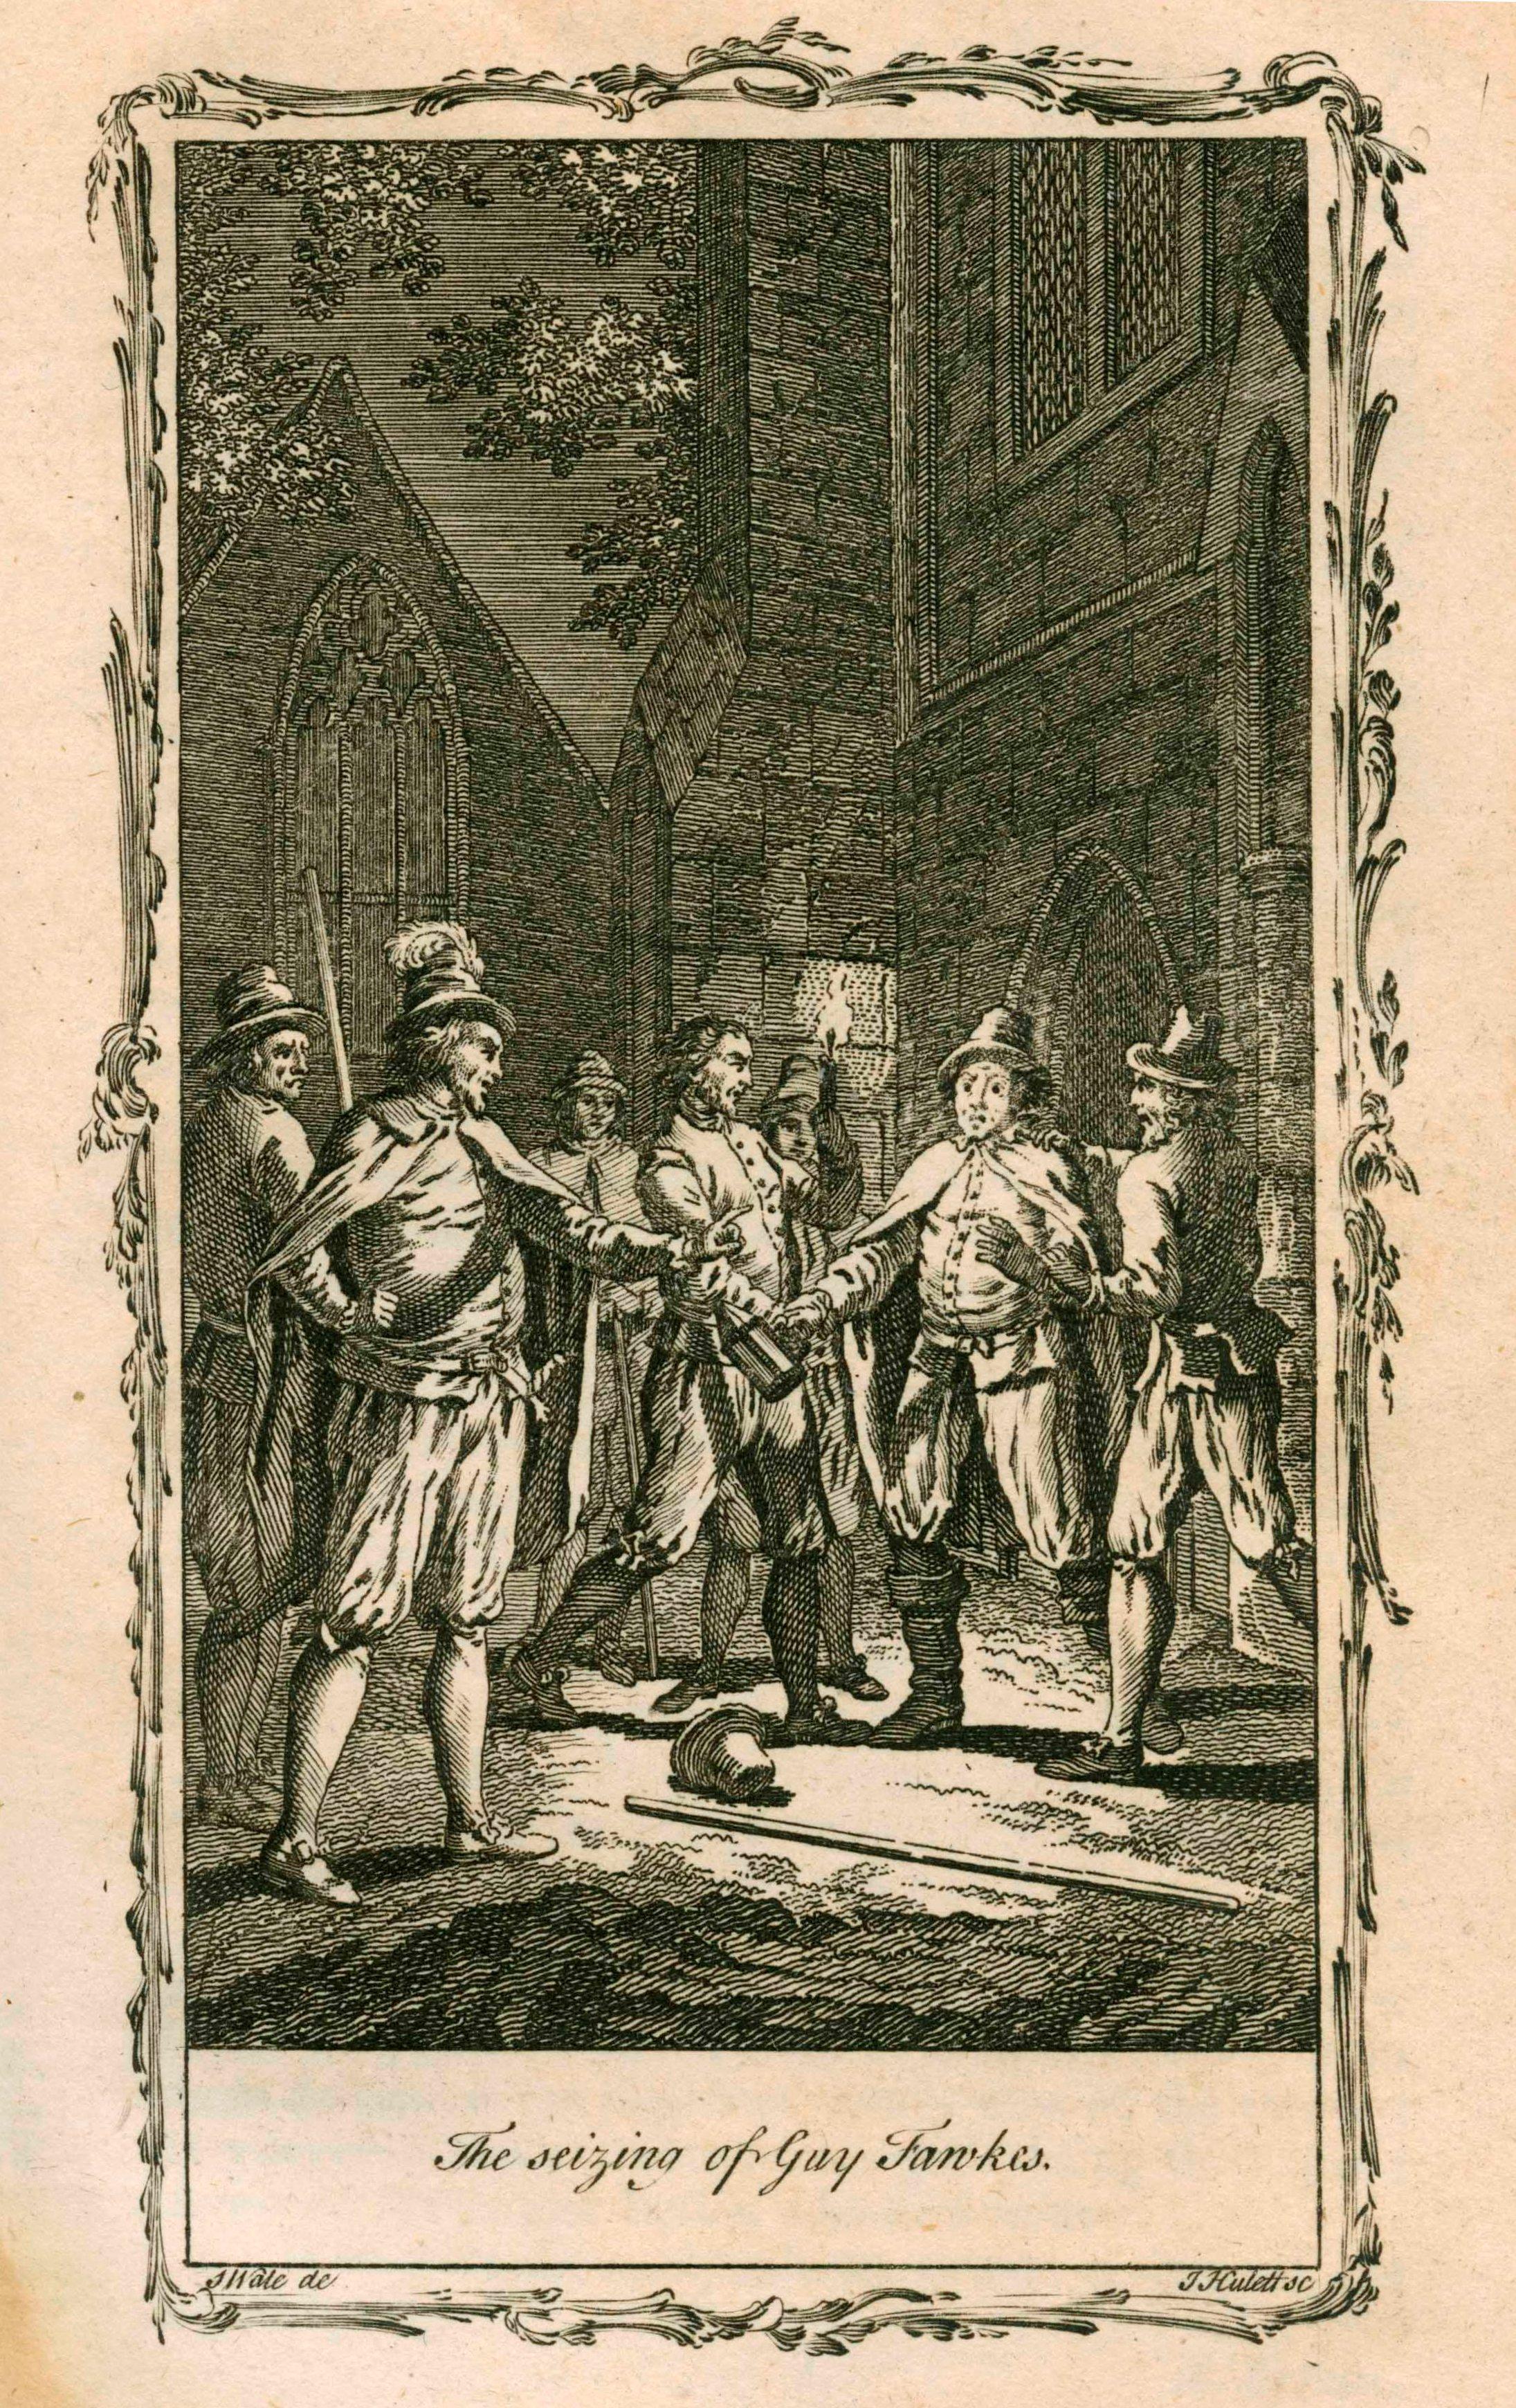 Gunpowder, Treason & Plot - Manuscripts and Special Collections